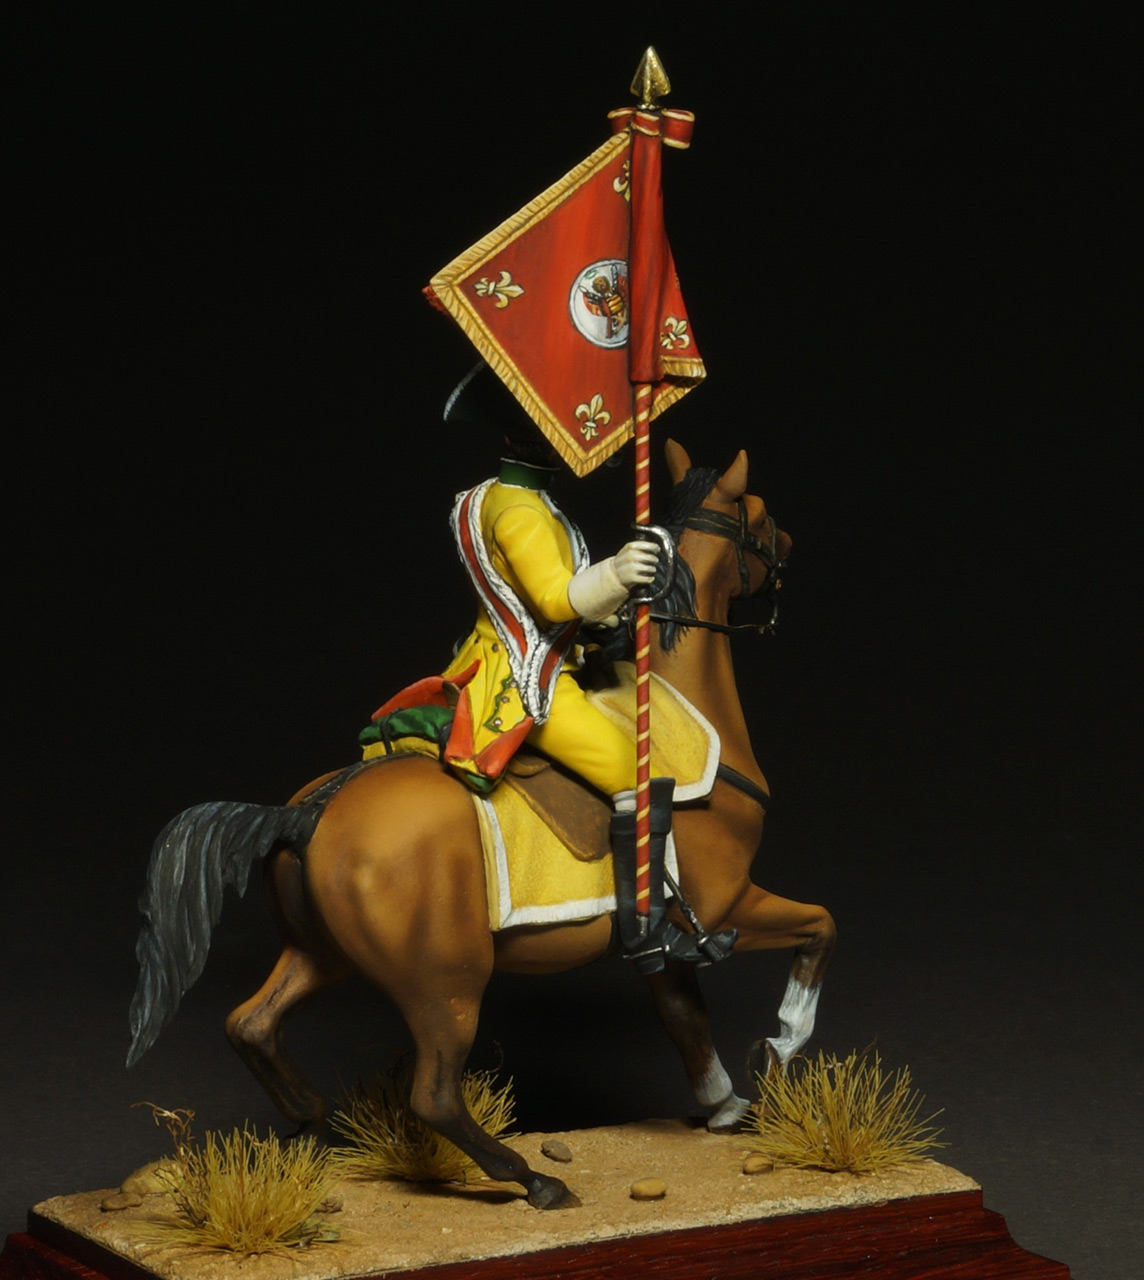 Фигурки: Драгунский знаменосец полка Villaviciosa, фото #7